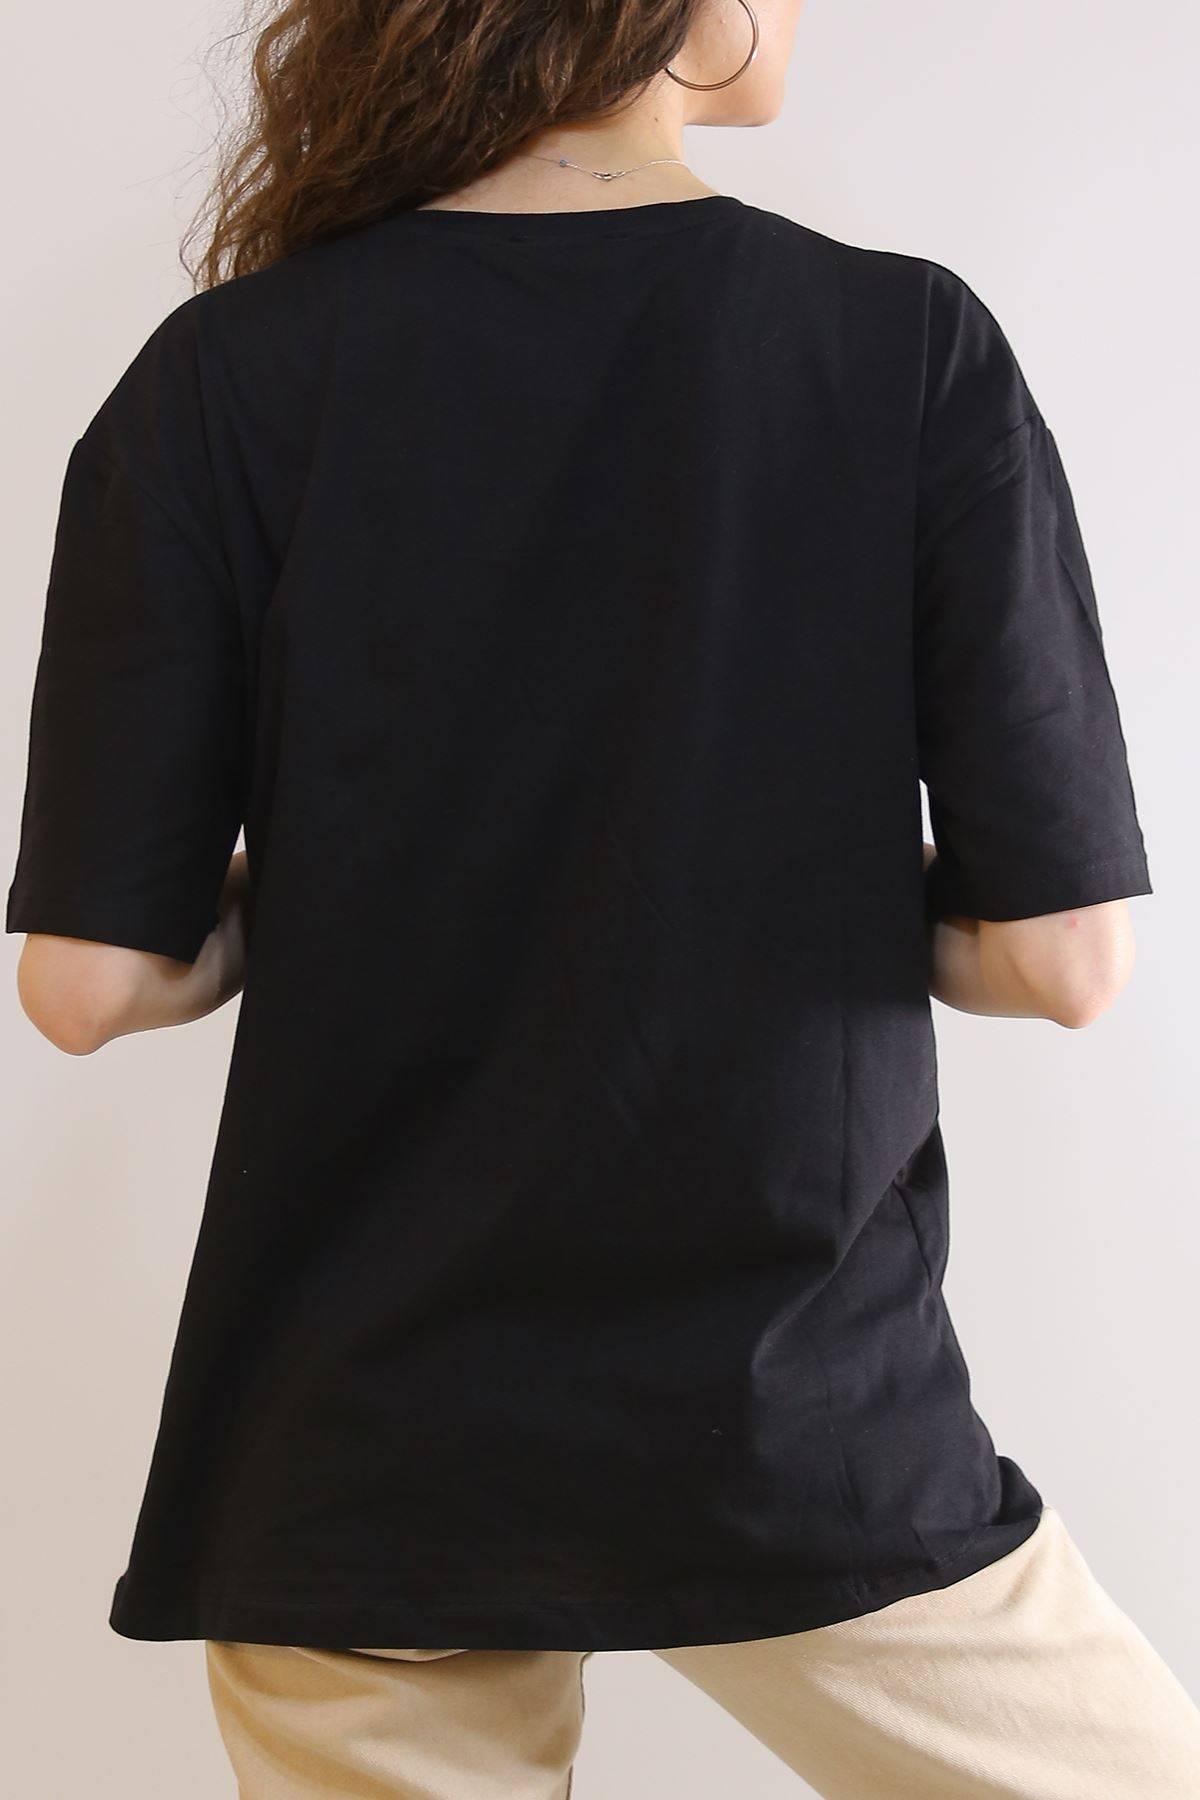 Ejderha Baskılı Tişört Siyah - 2906.992.